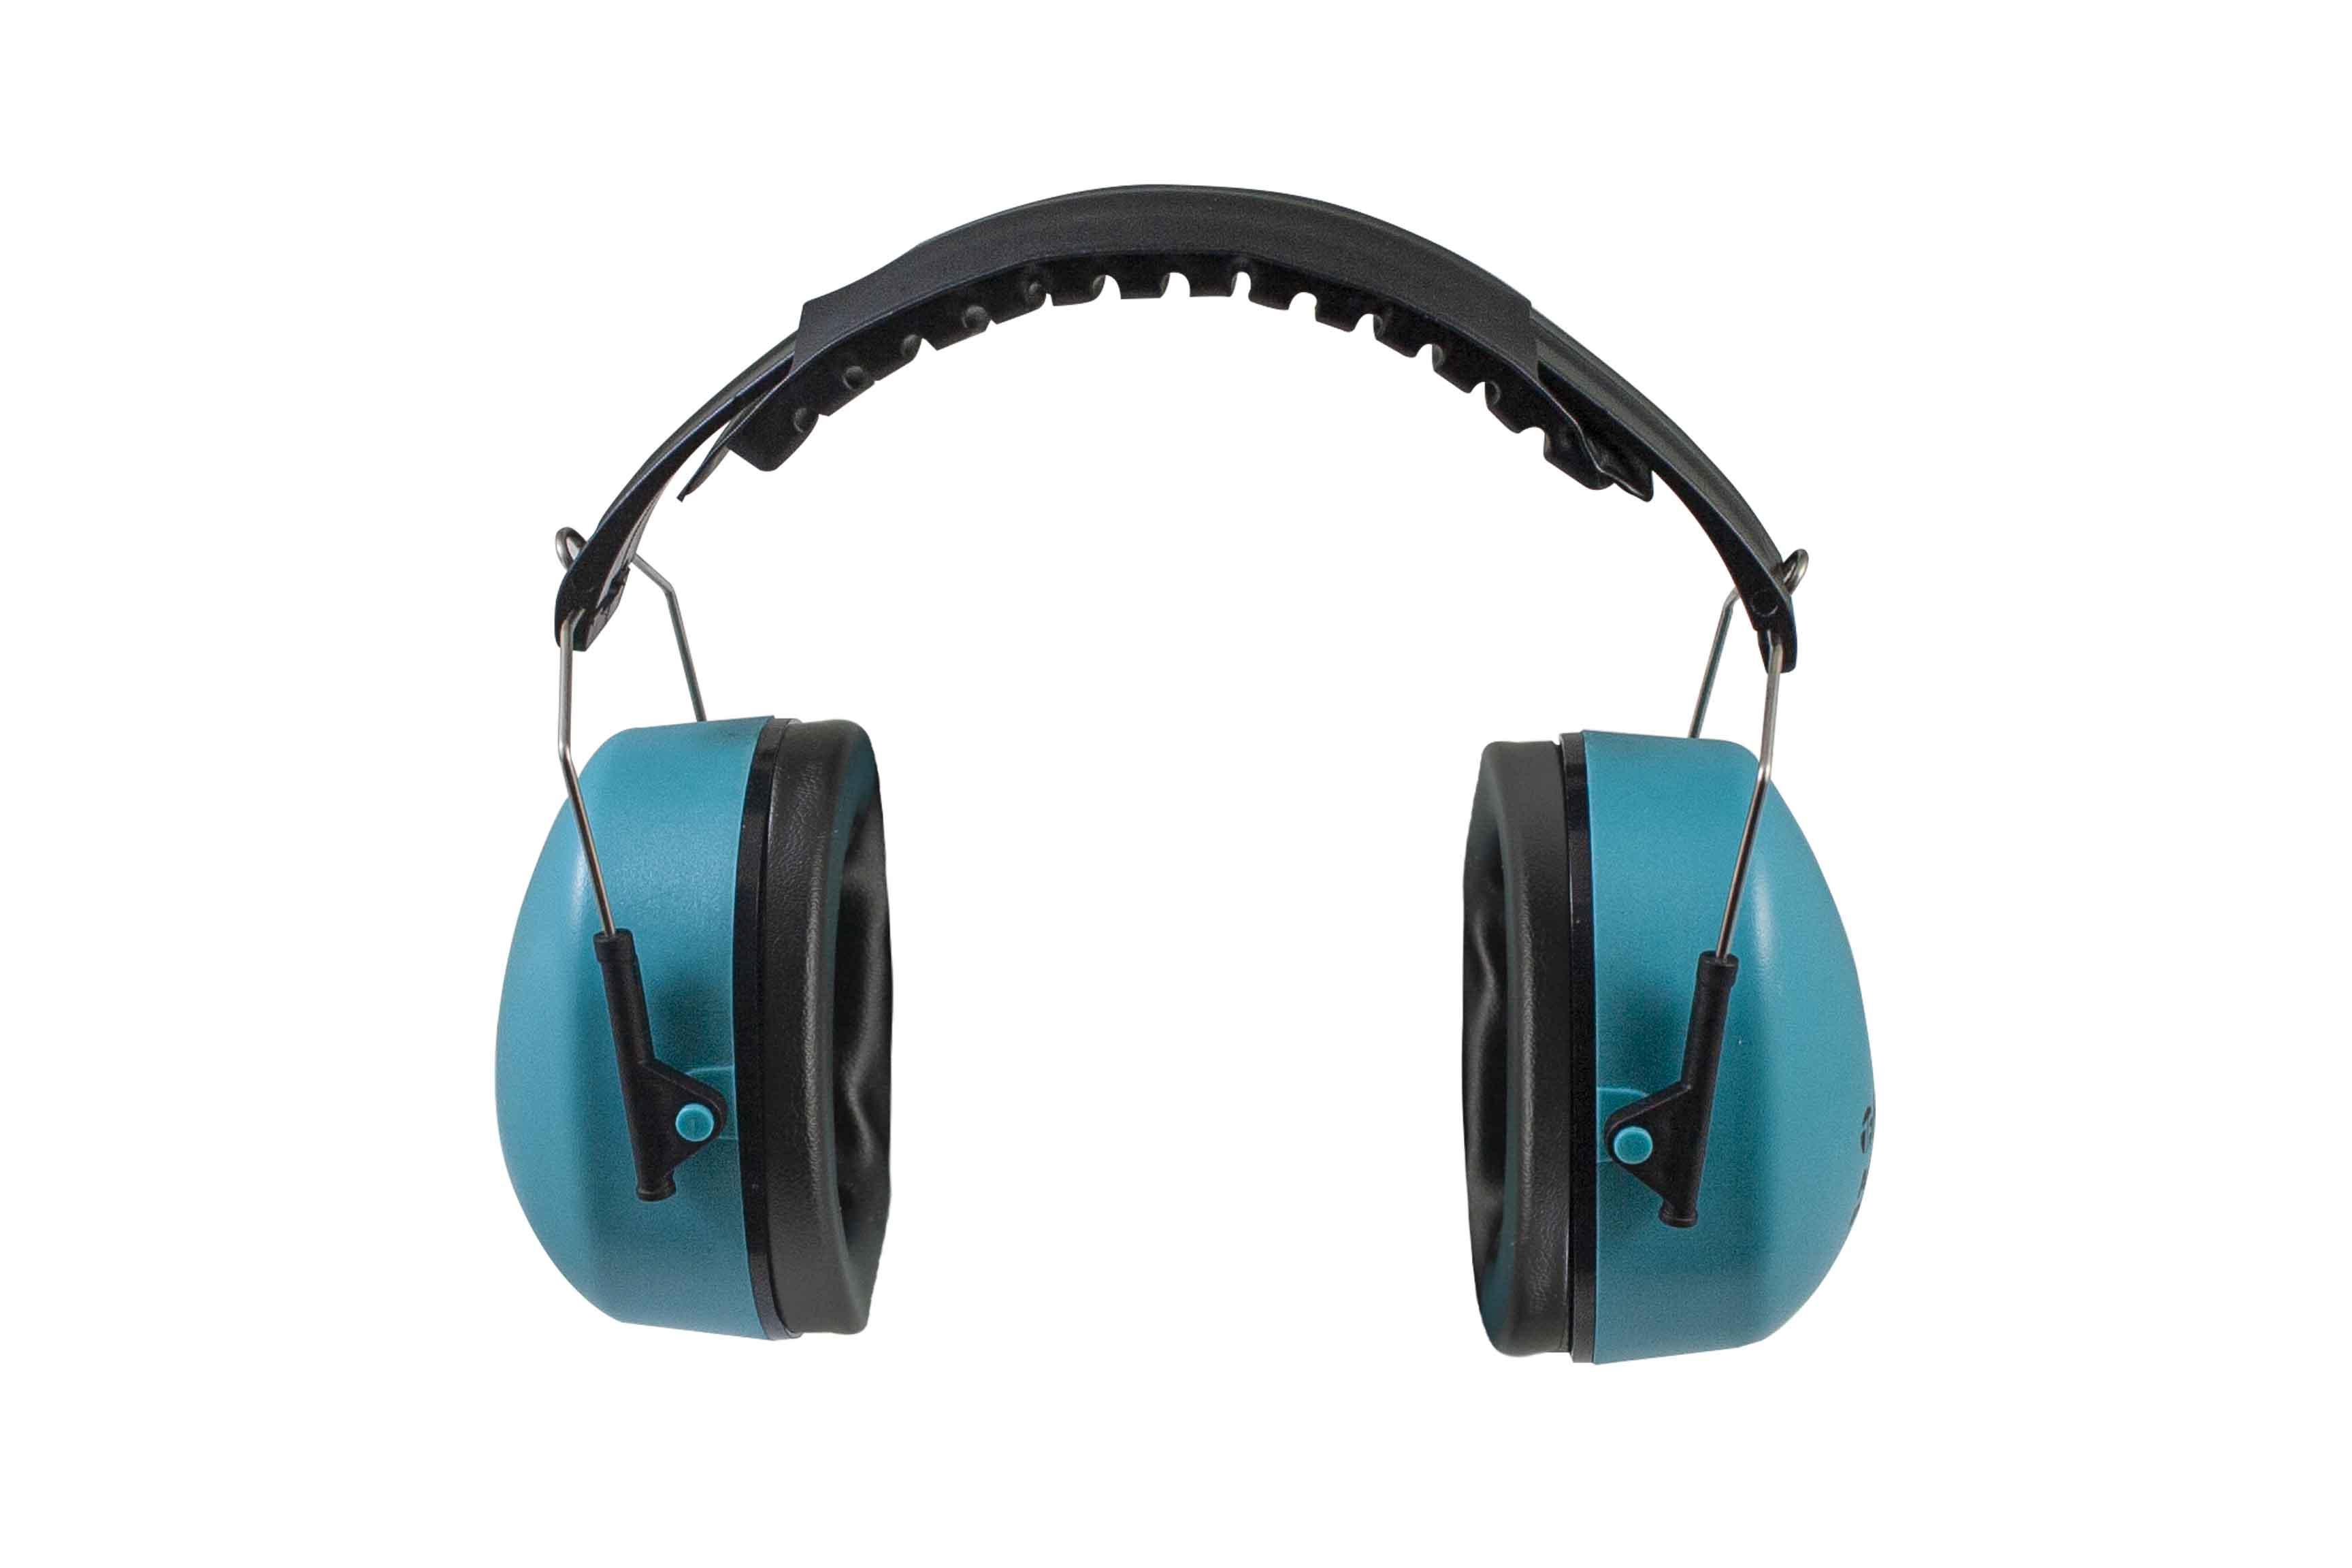 PROFESSIONAL ANTINOISE HEADPHONE